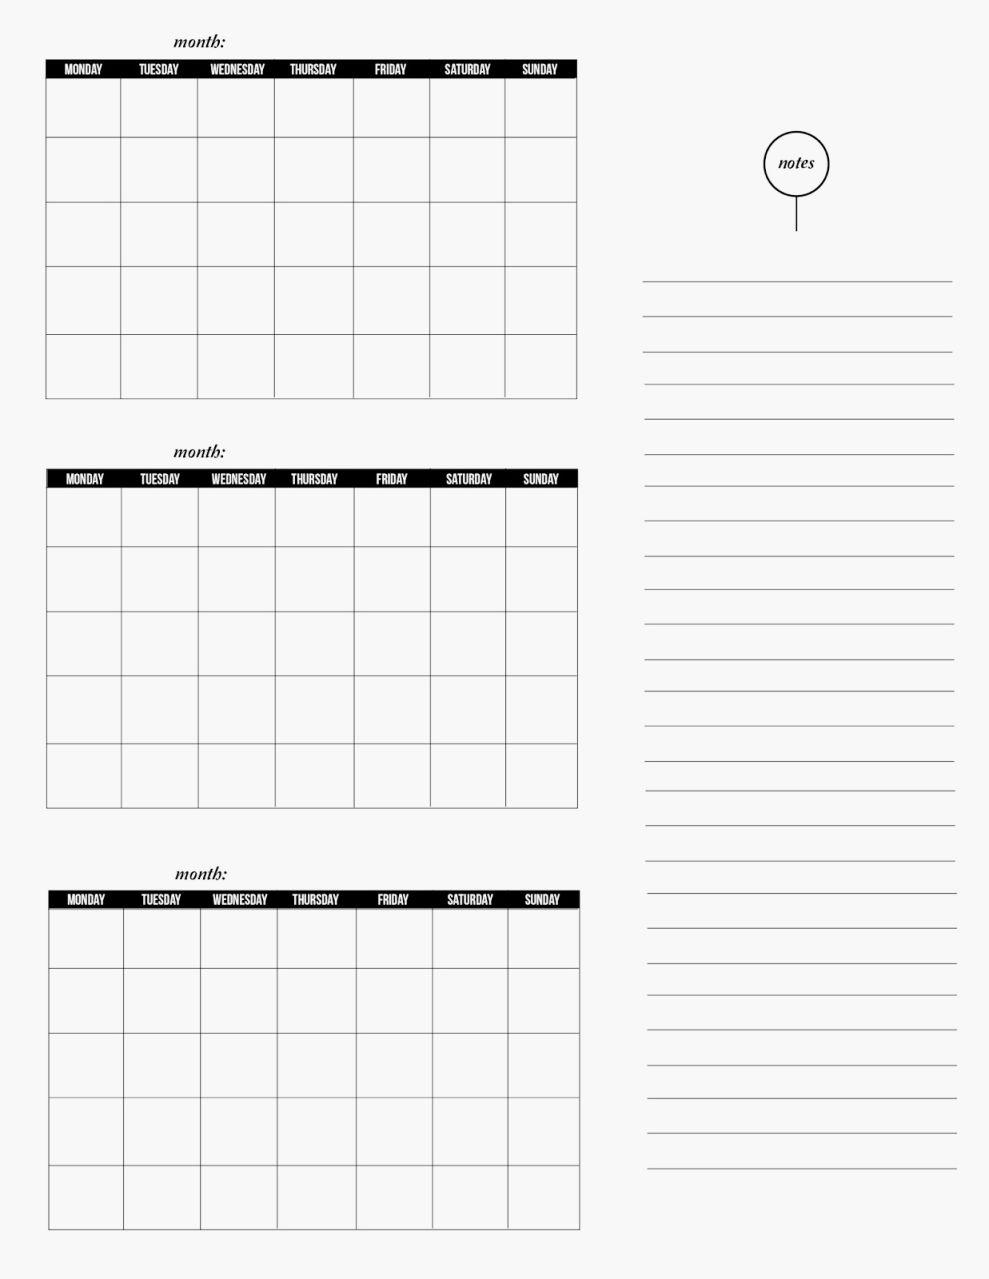 Depo Provera Perpetual Printable Calendar 2018 – Template